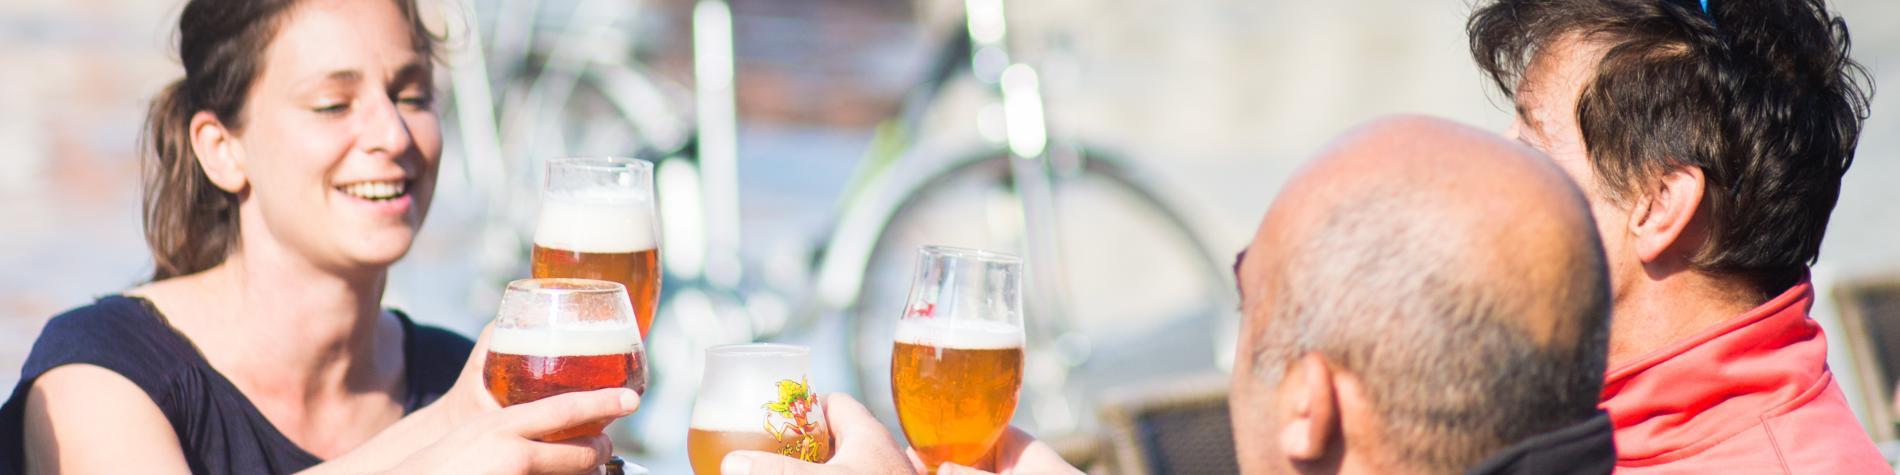 Tournai - terrasse - Grand-Place - bière - café